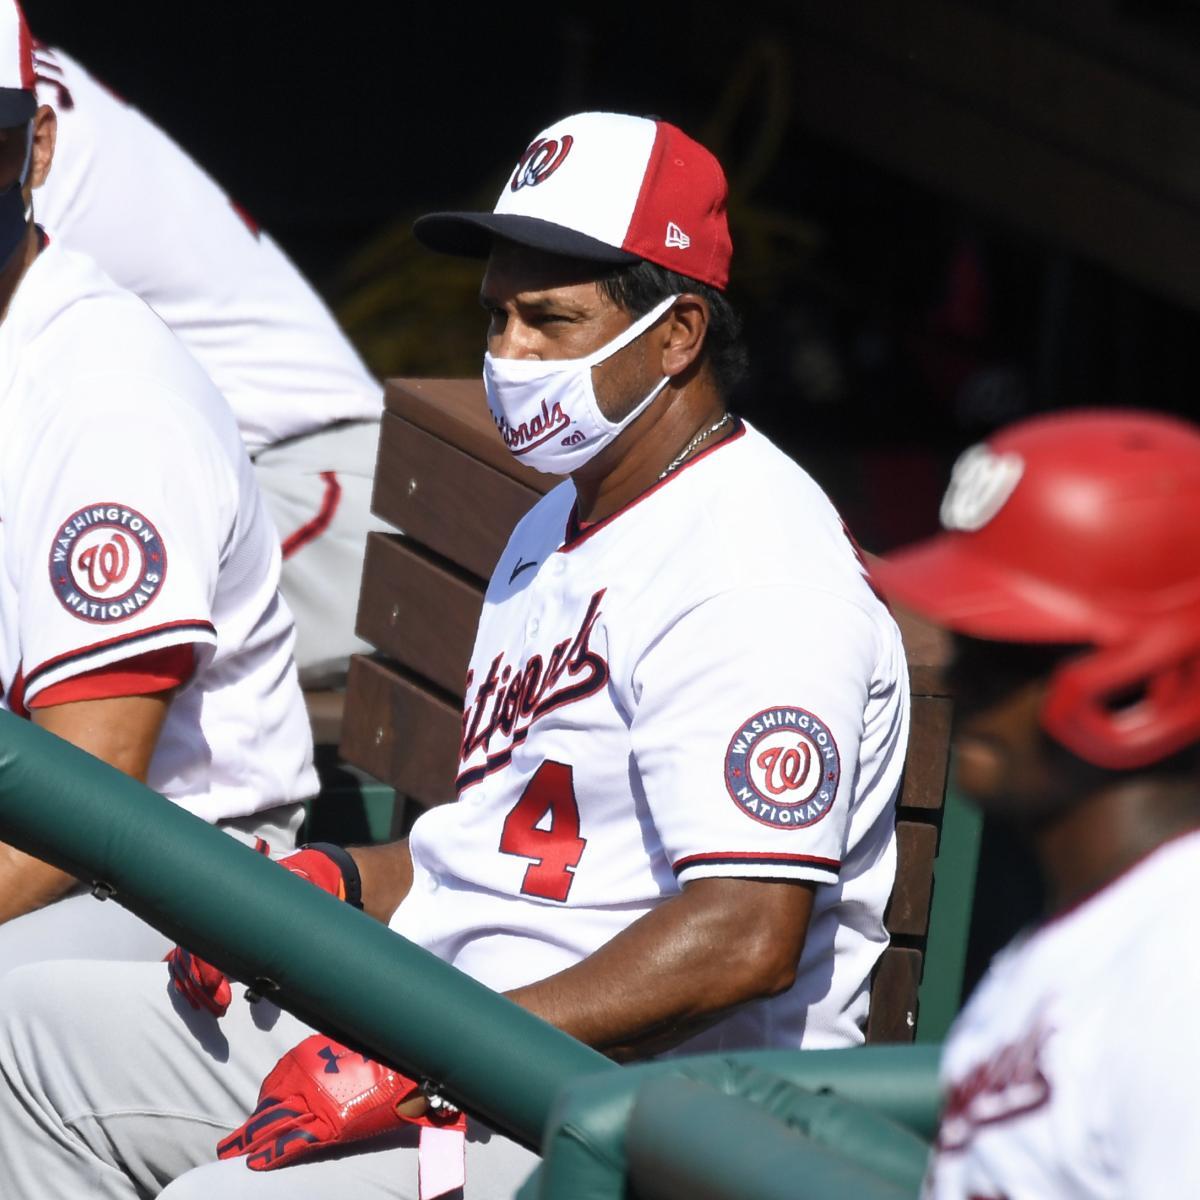 Scott Miller's Guide to the Unknown: Making Sense of MLB's 2020 Season thumbnail